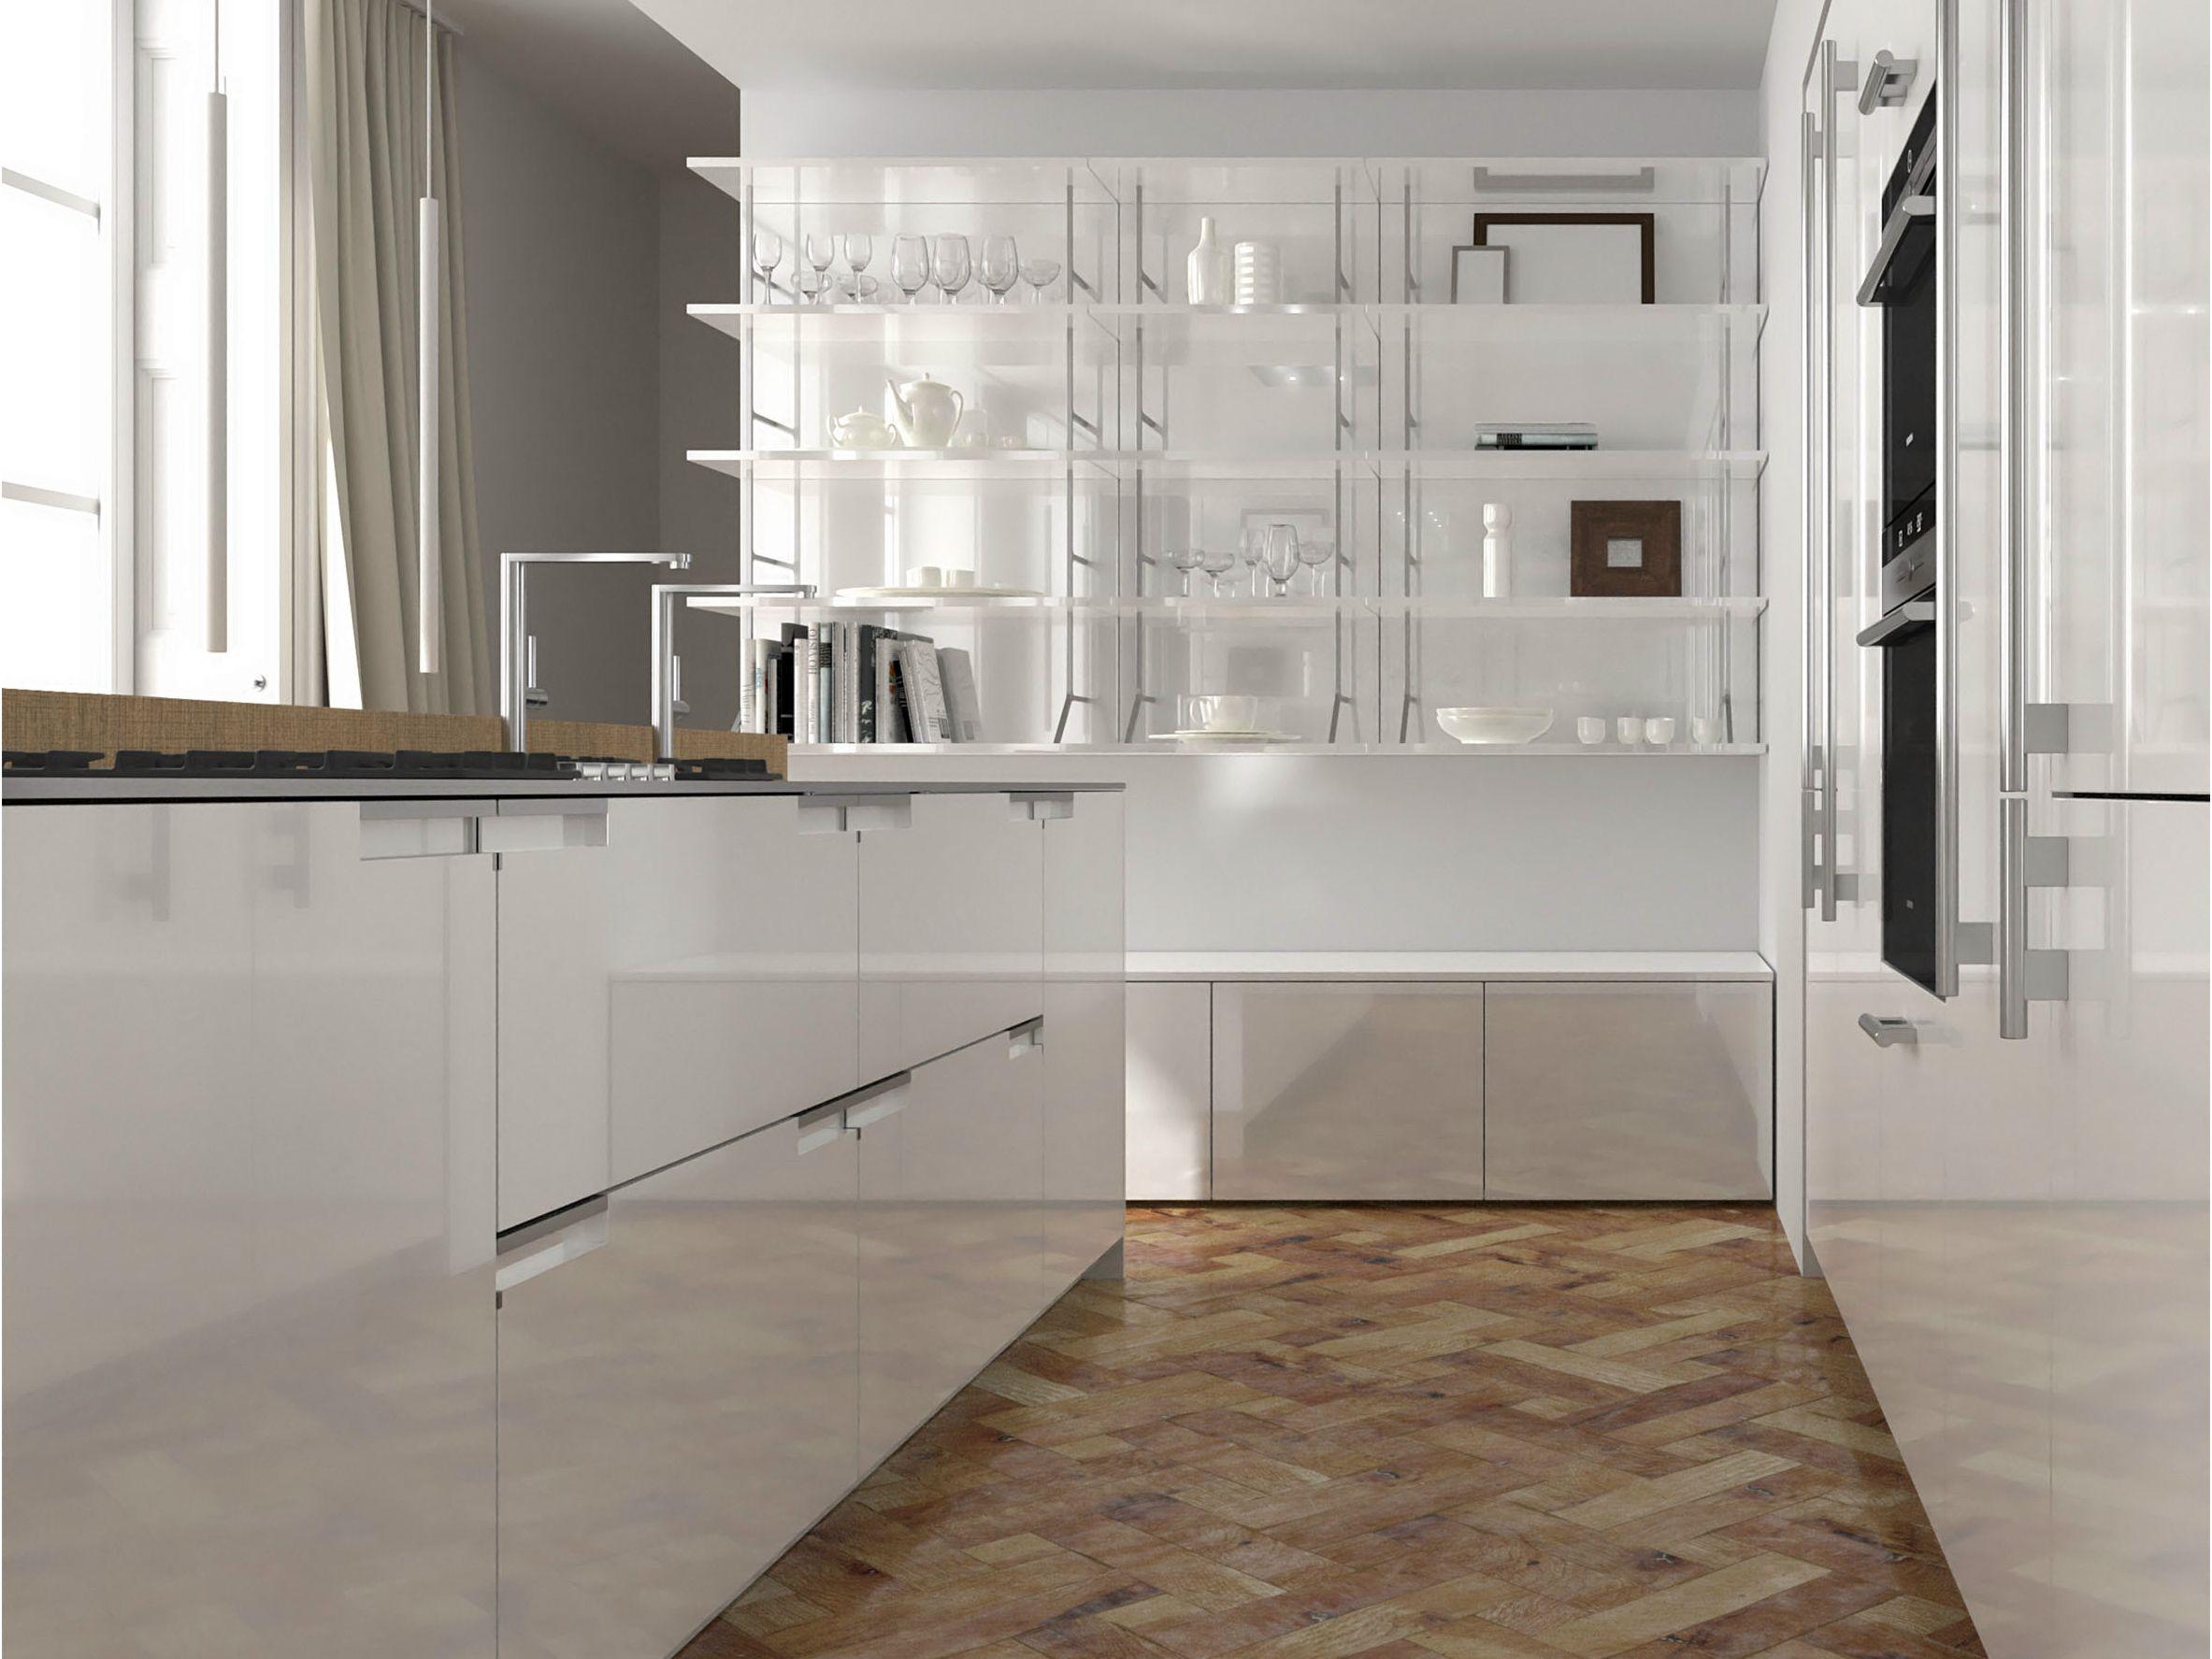 lackierte k che aus eichenholz noblesse k che aus eicheholz by aster cucine design lorenzo. Black Bedroom Furniture Sets. Home Design Ideas